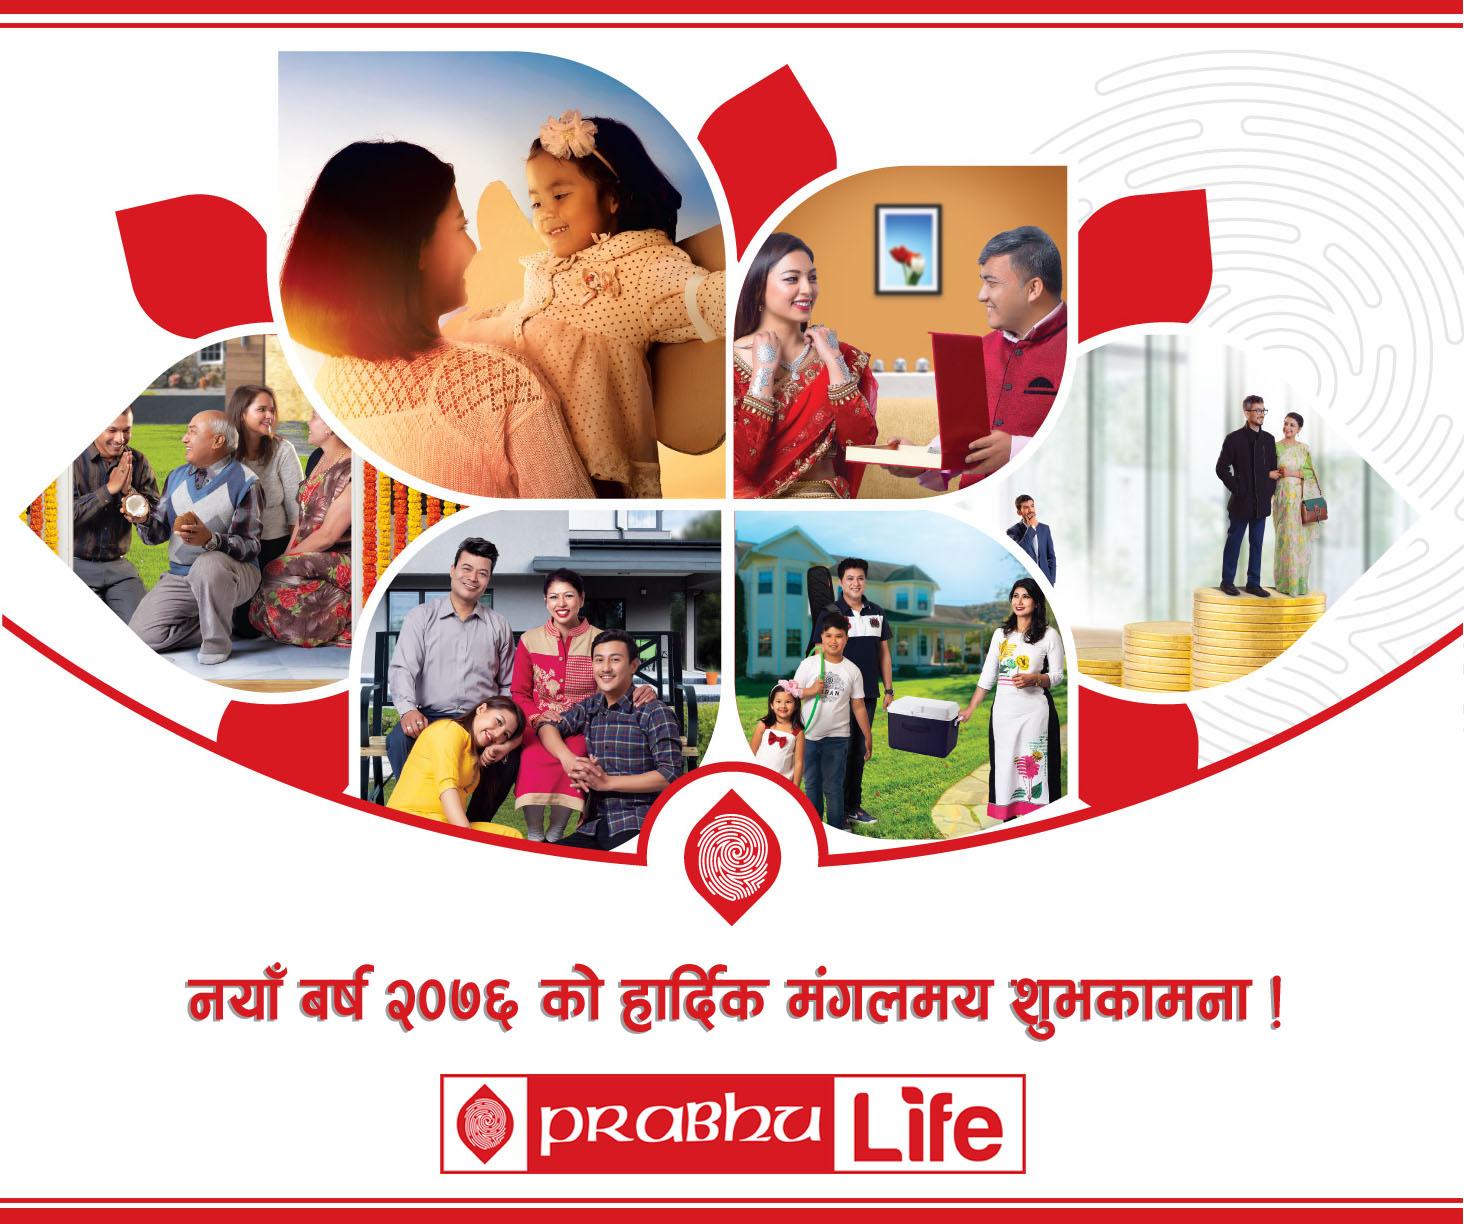 Prabhu Life Insurance wishes you Happy New Year 2076